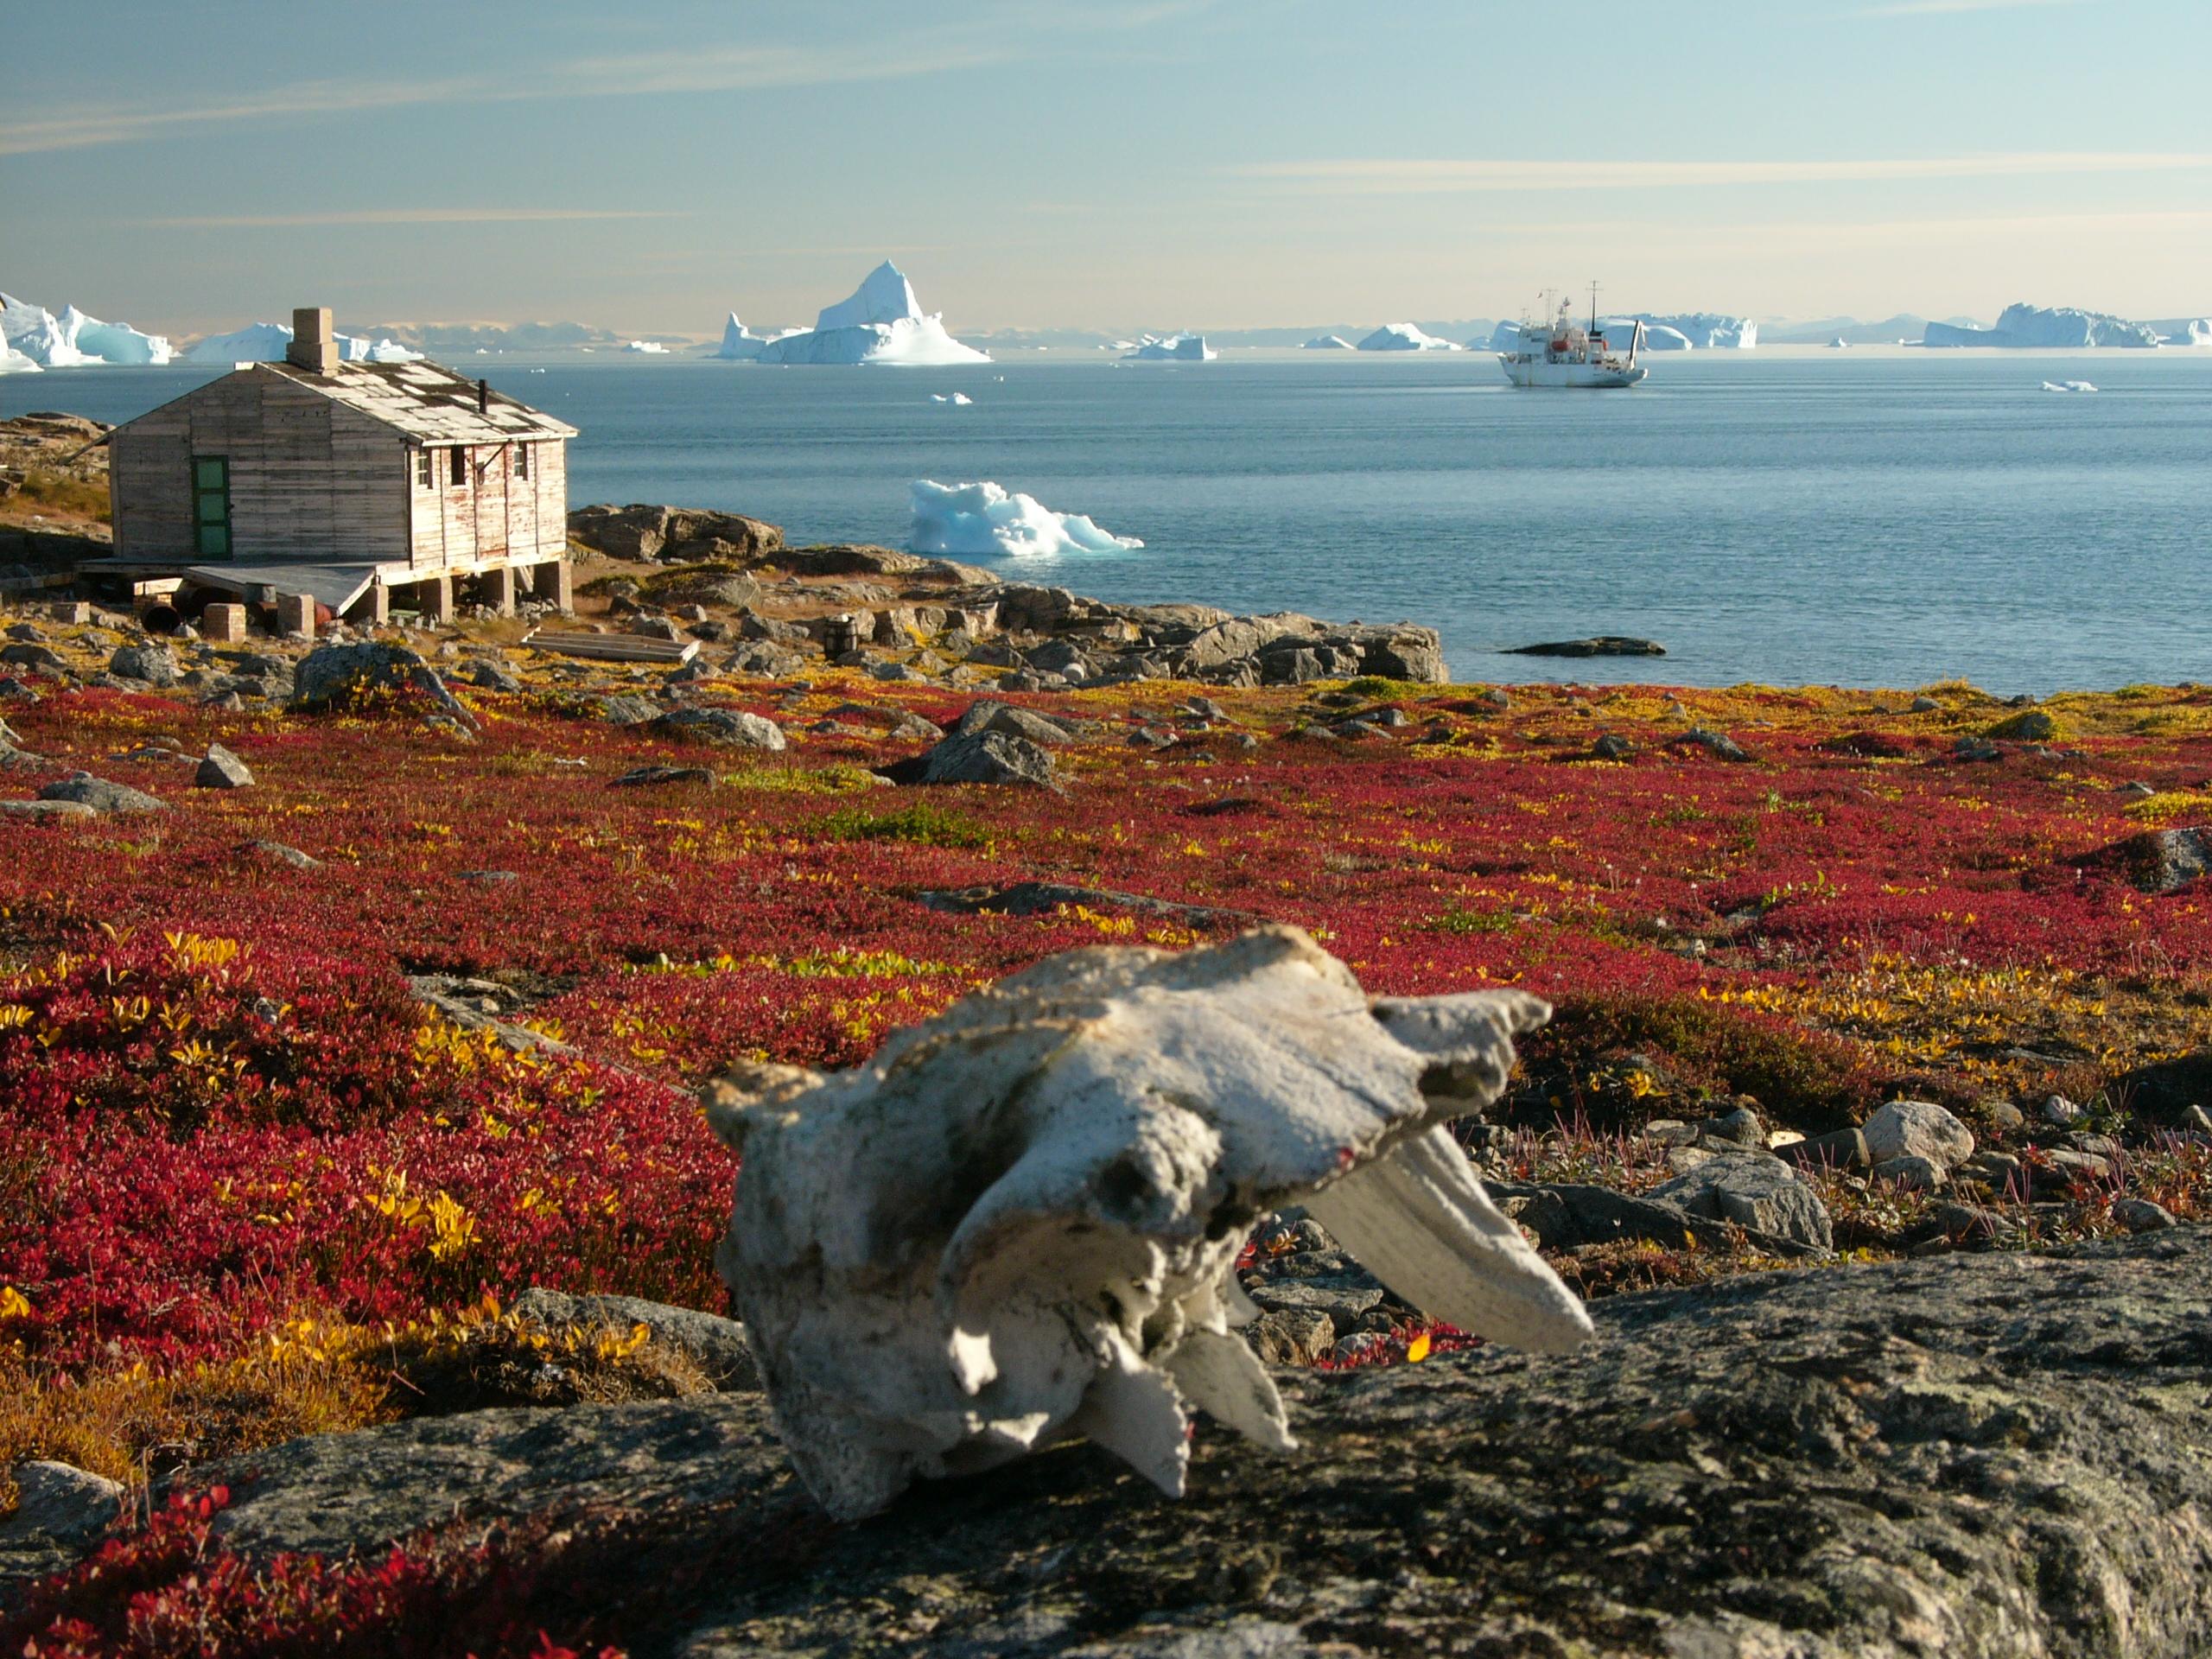 File:Greenland scoresby-sydkapp2 hg jpg - Wikimedia Commons